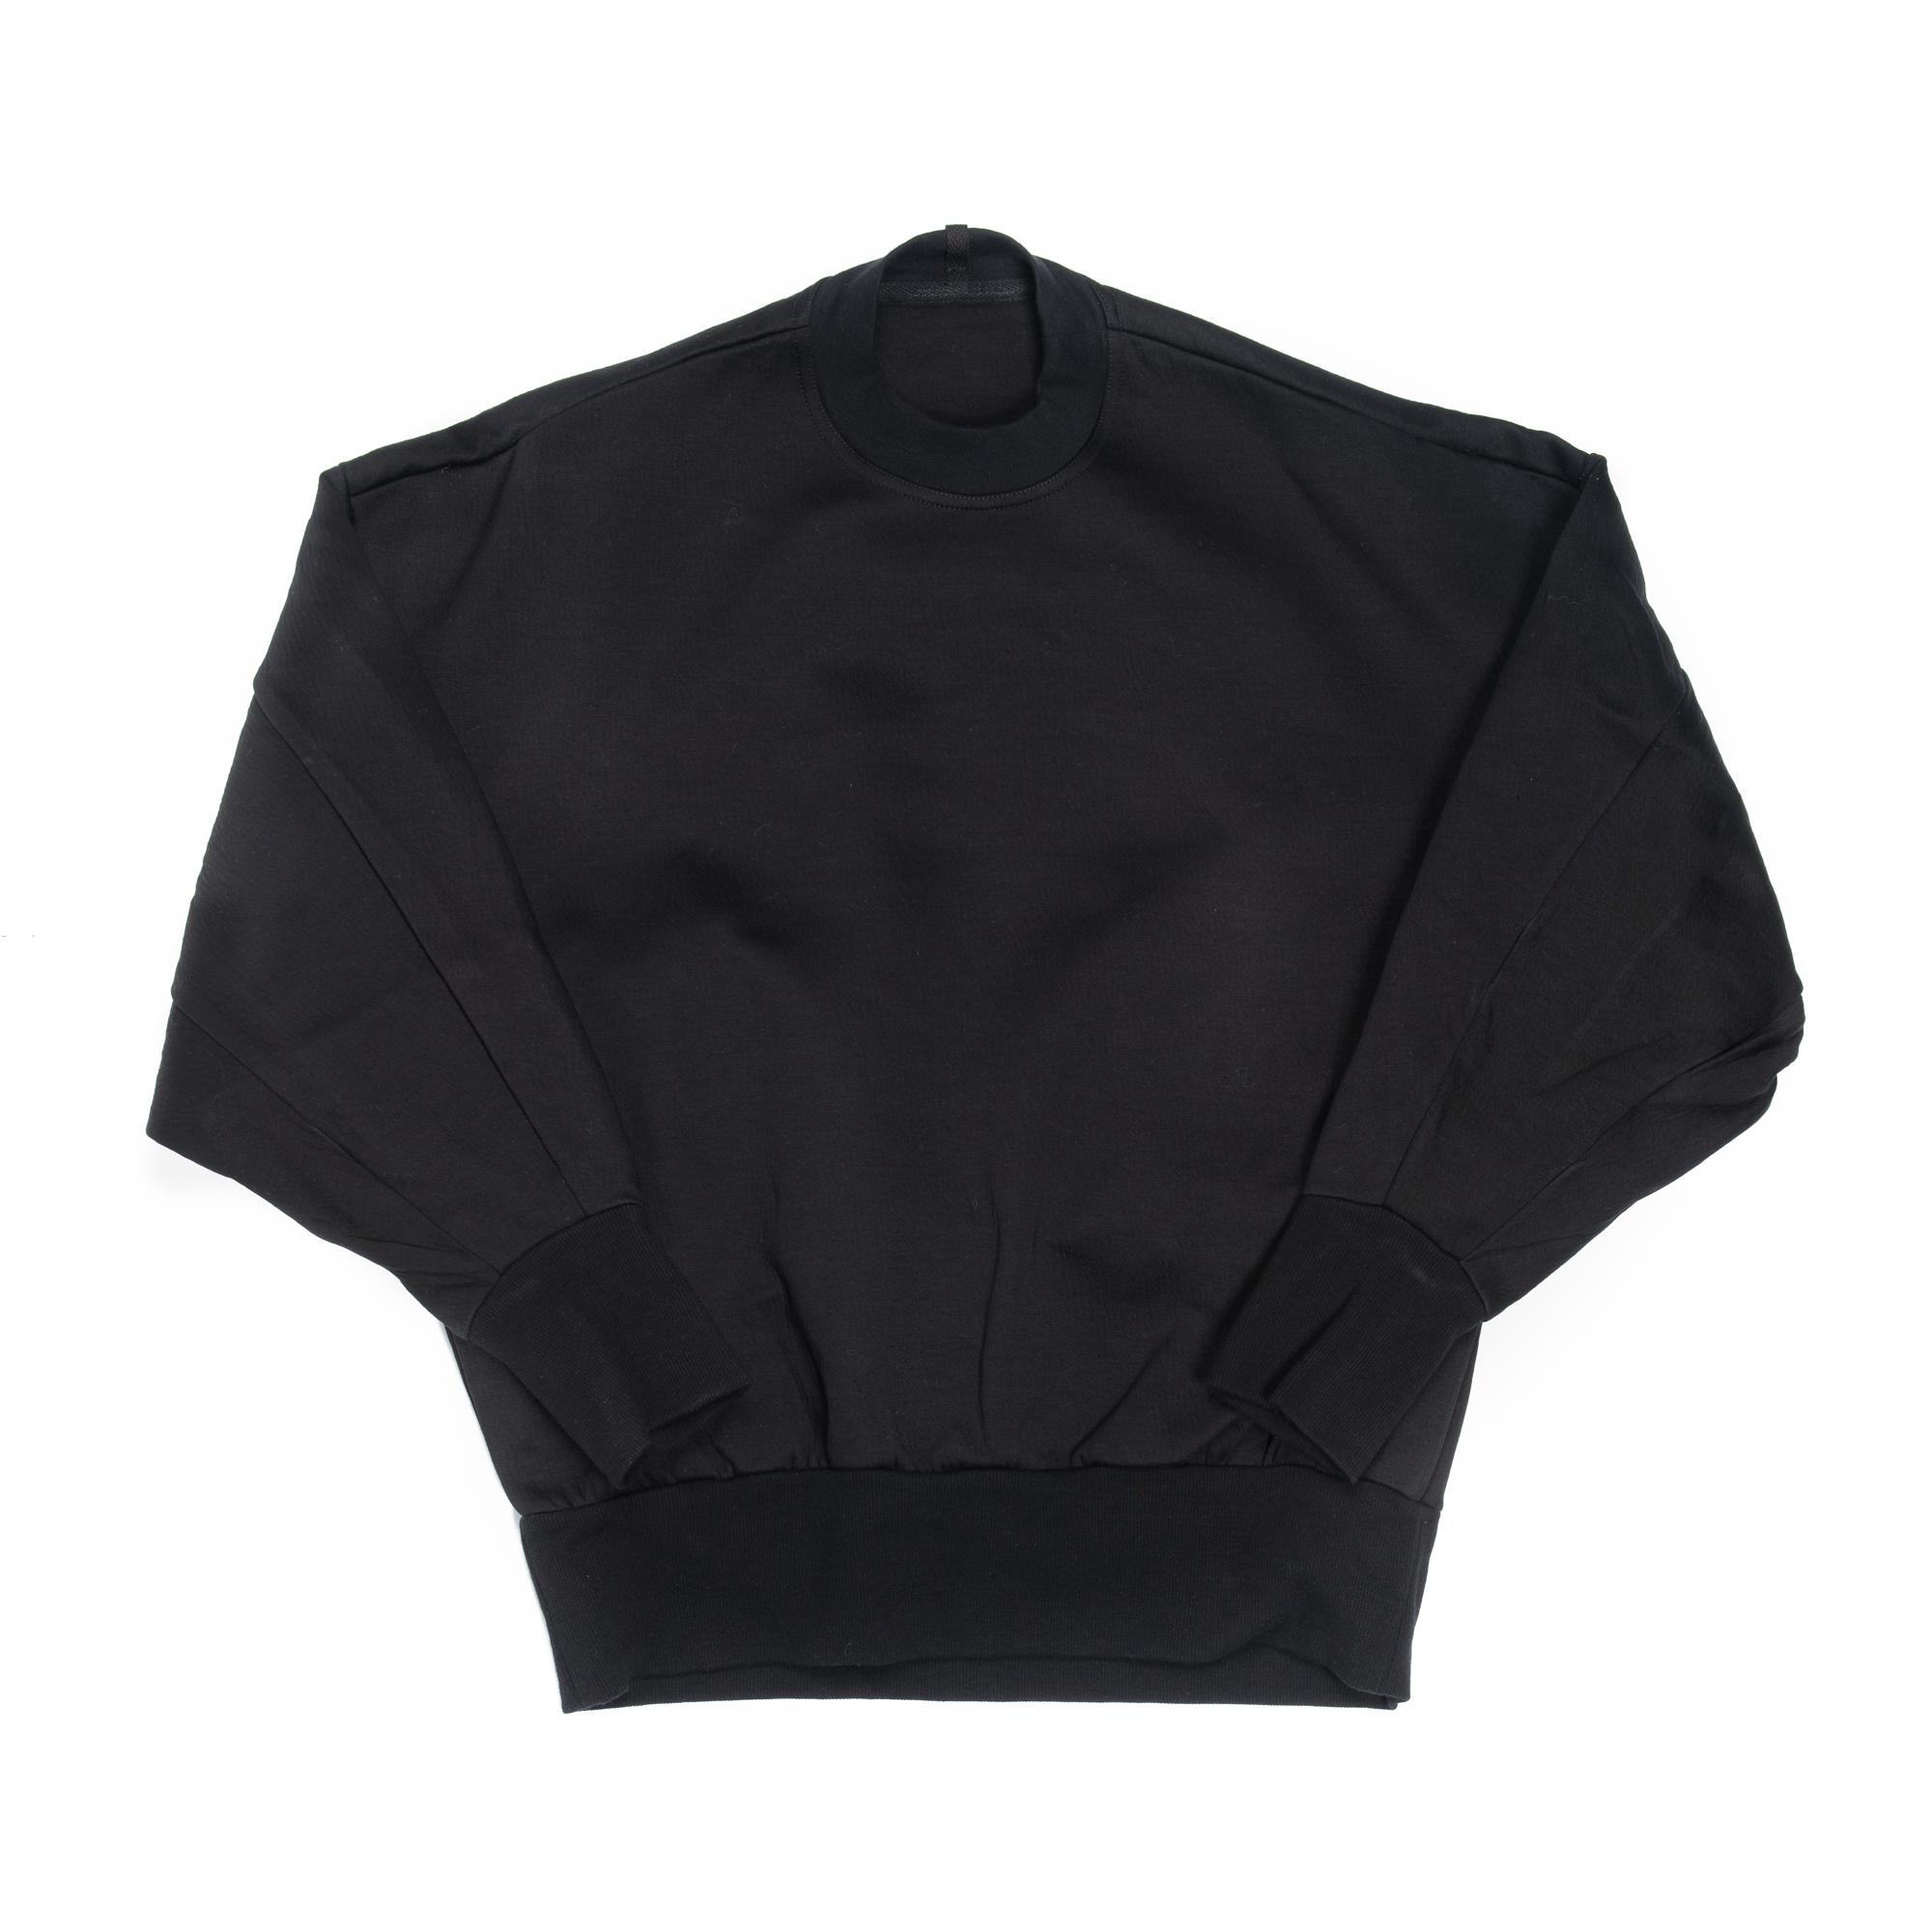 657CUM2-BLACK / バックストラップ スウェットシャツ